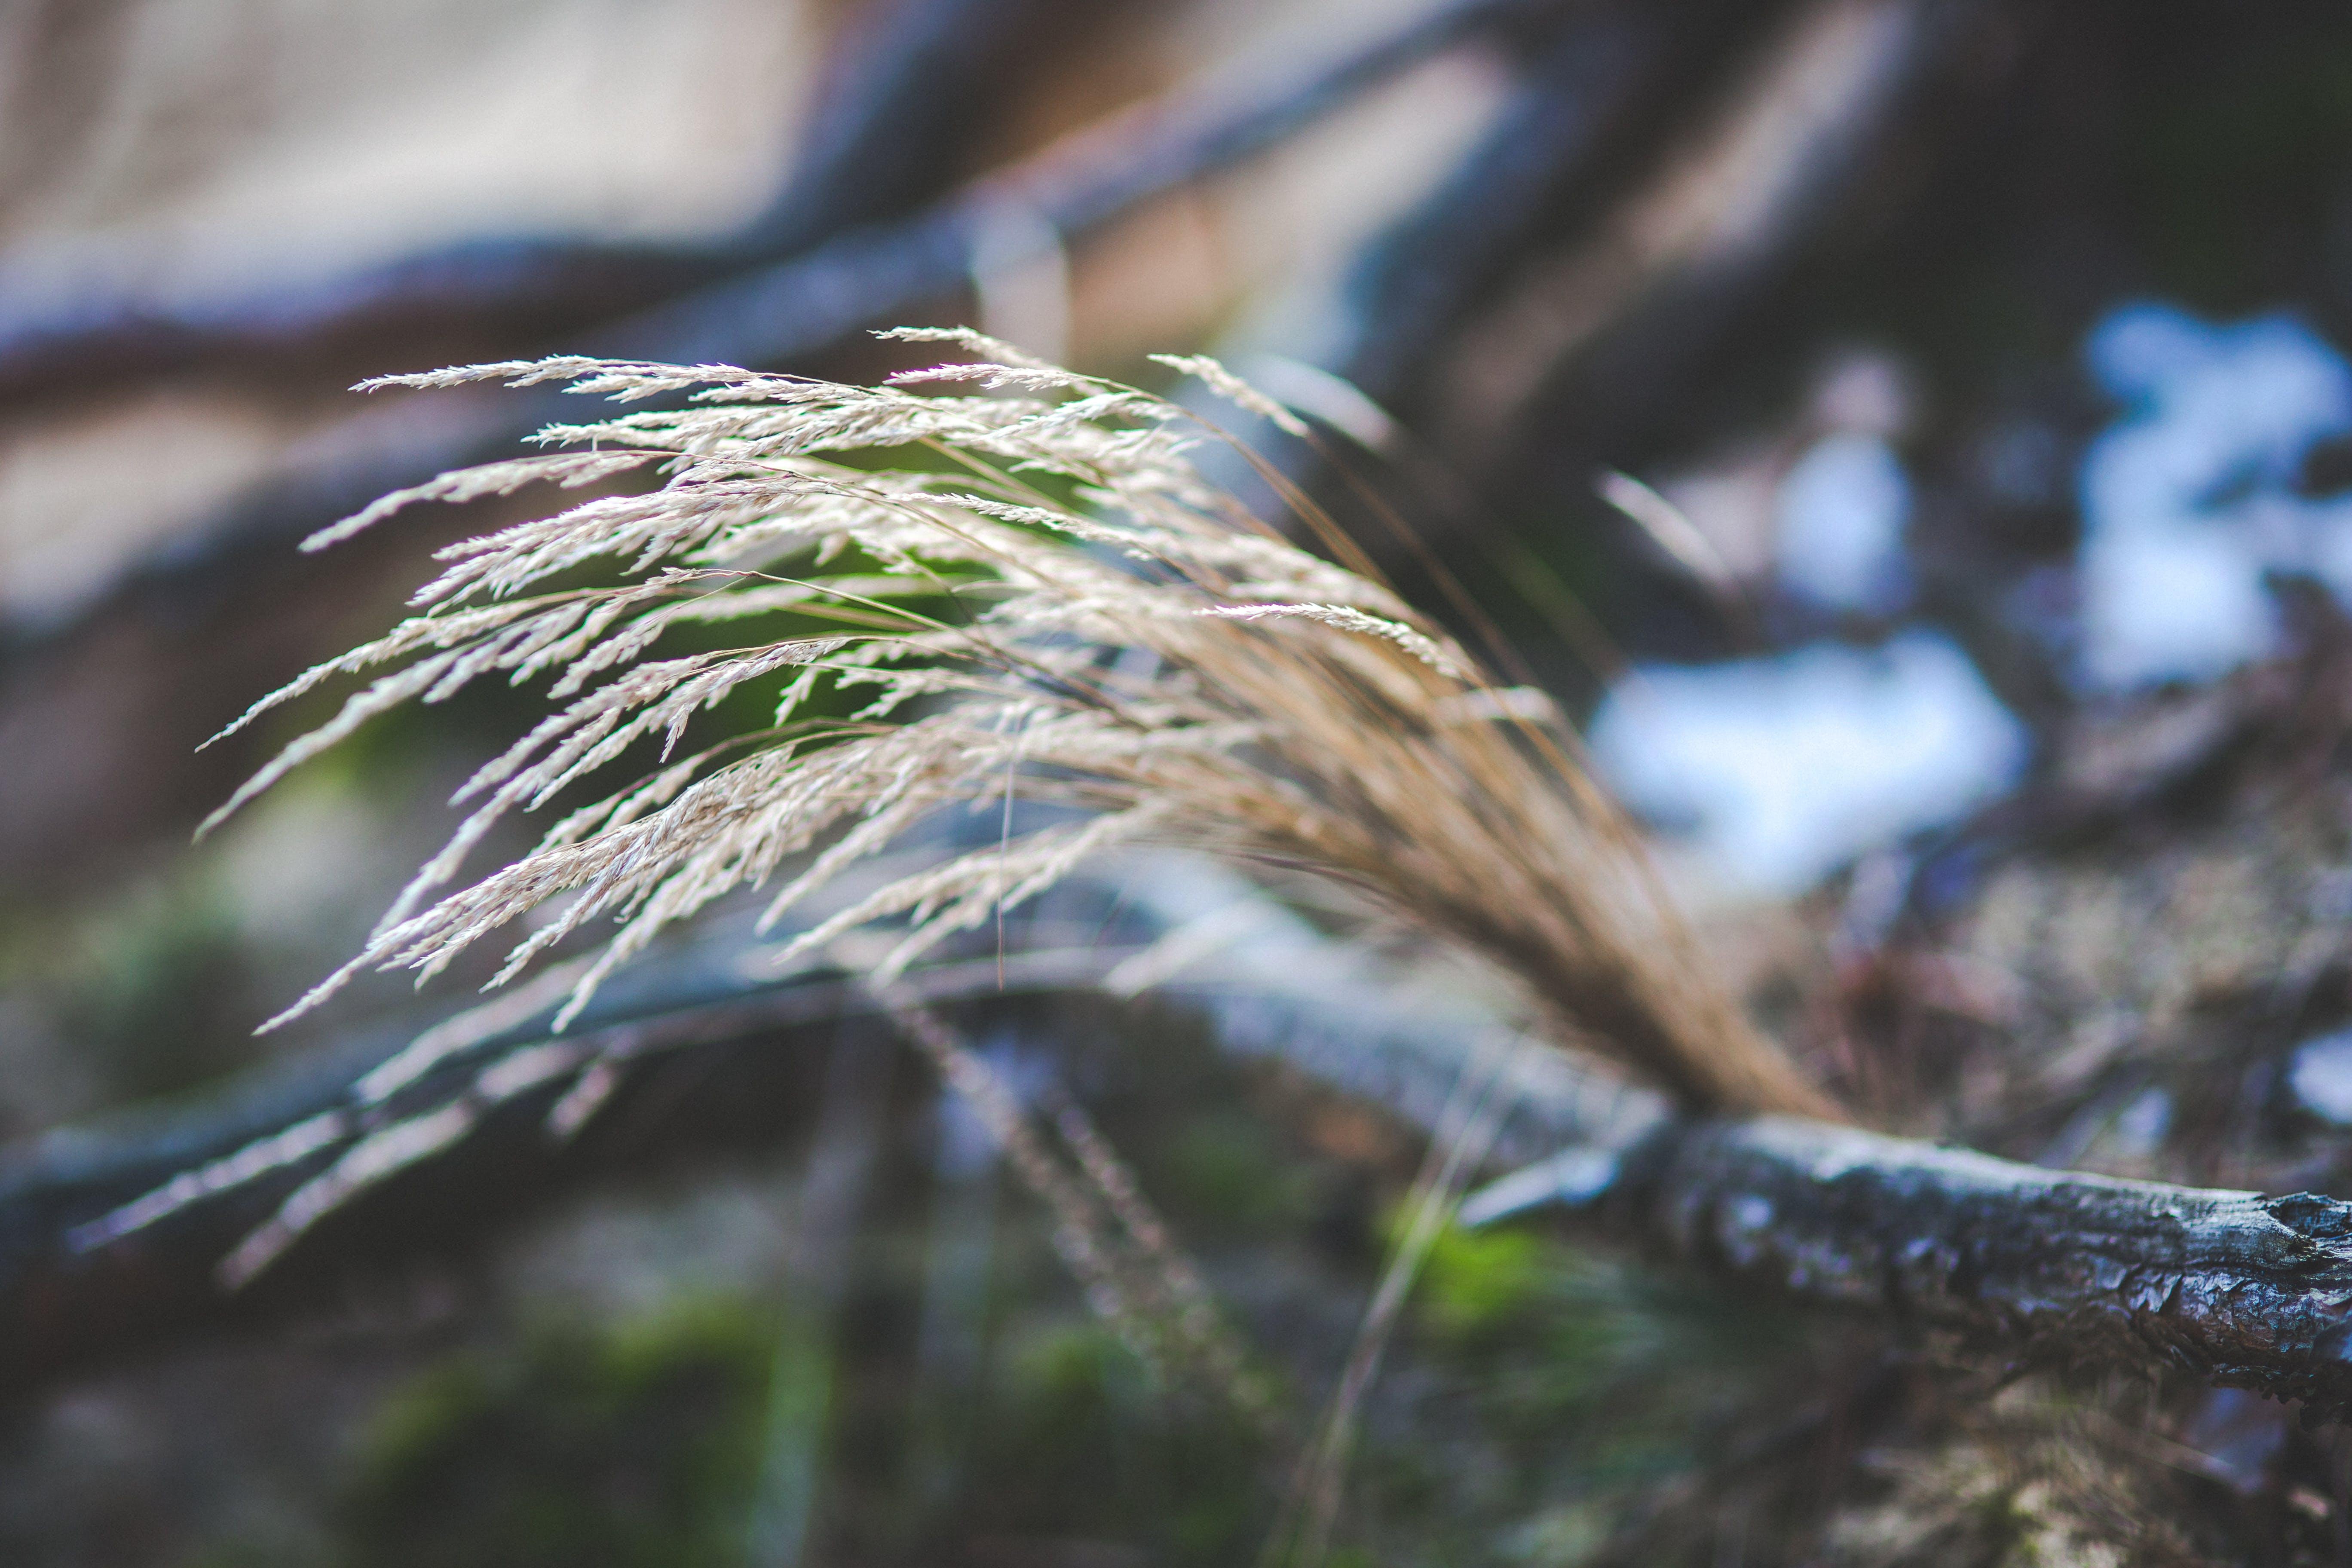 Closeup view of long dry grass / Depth of Field